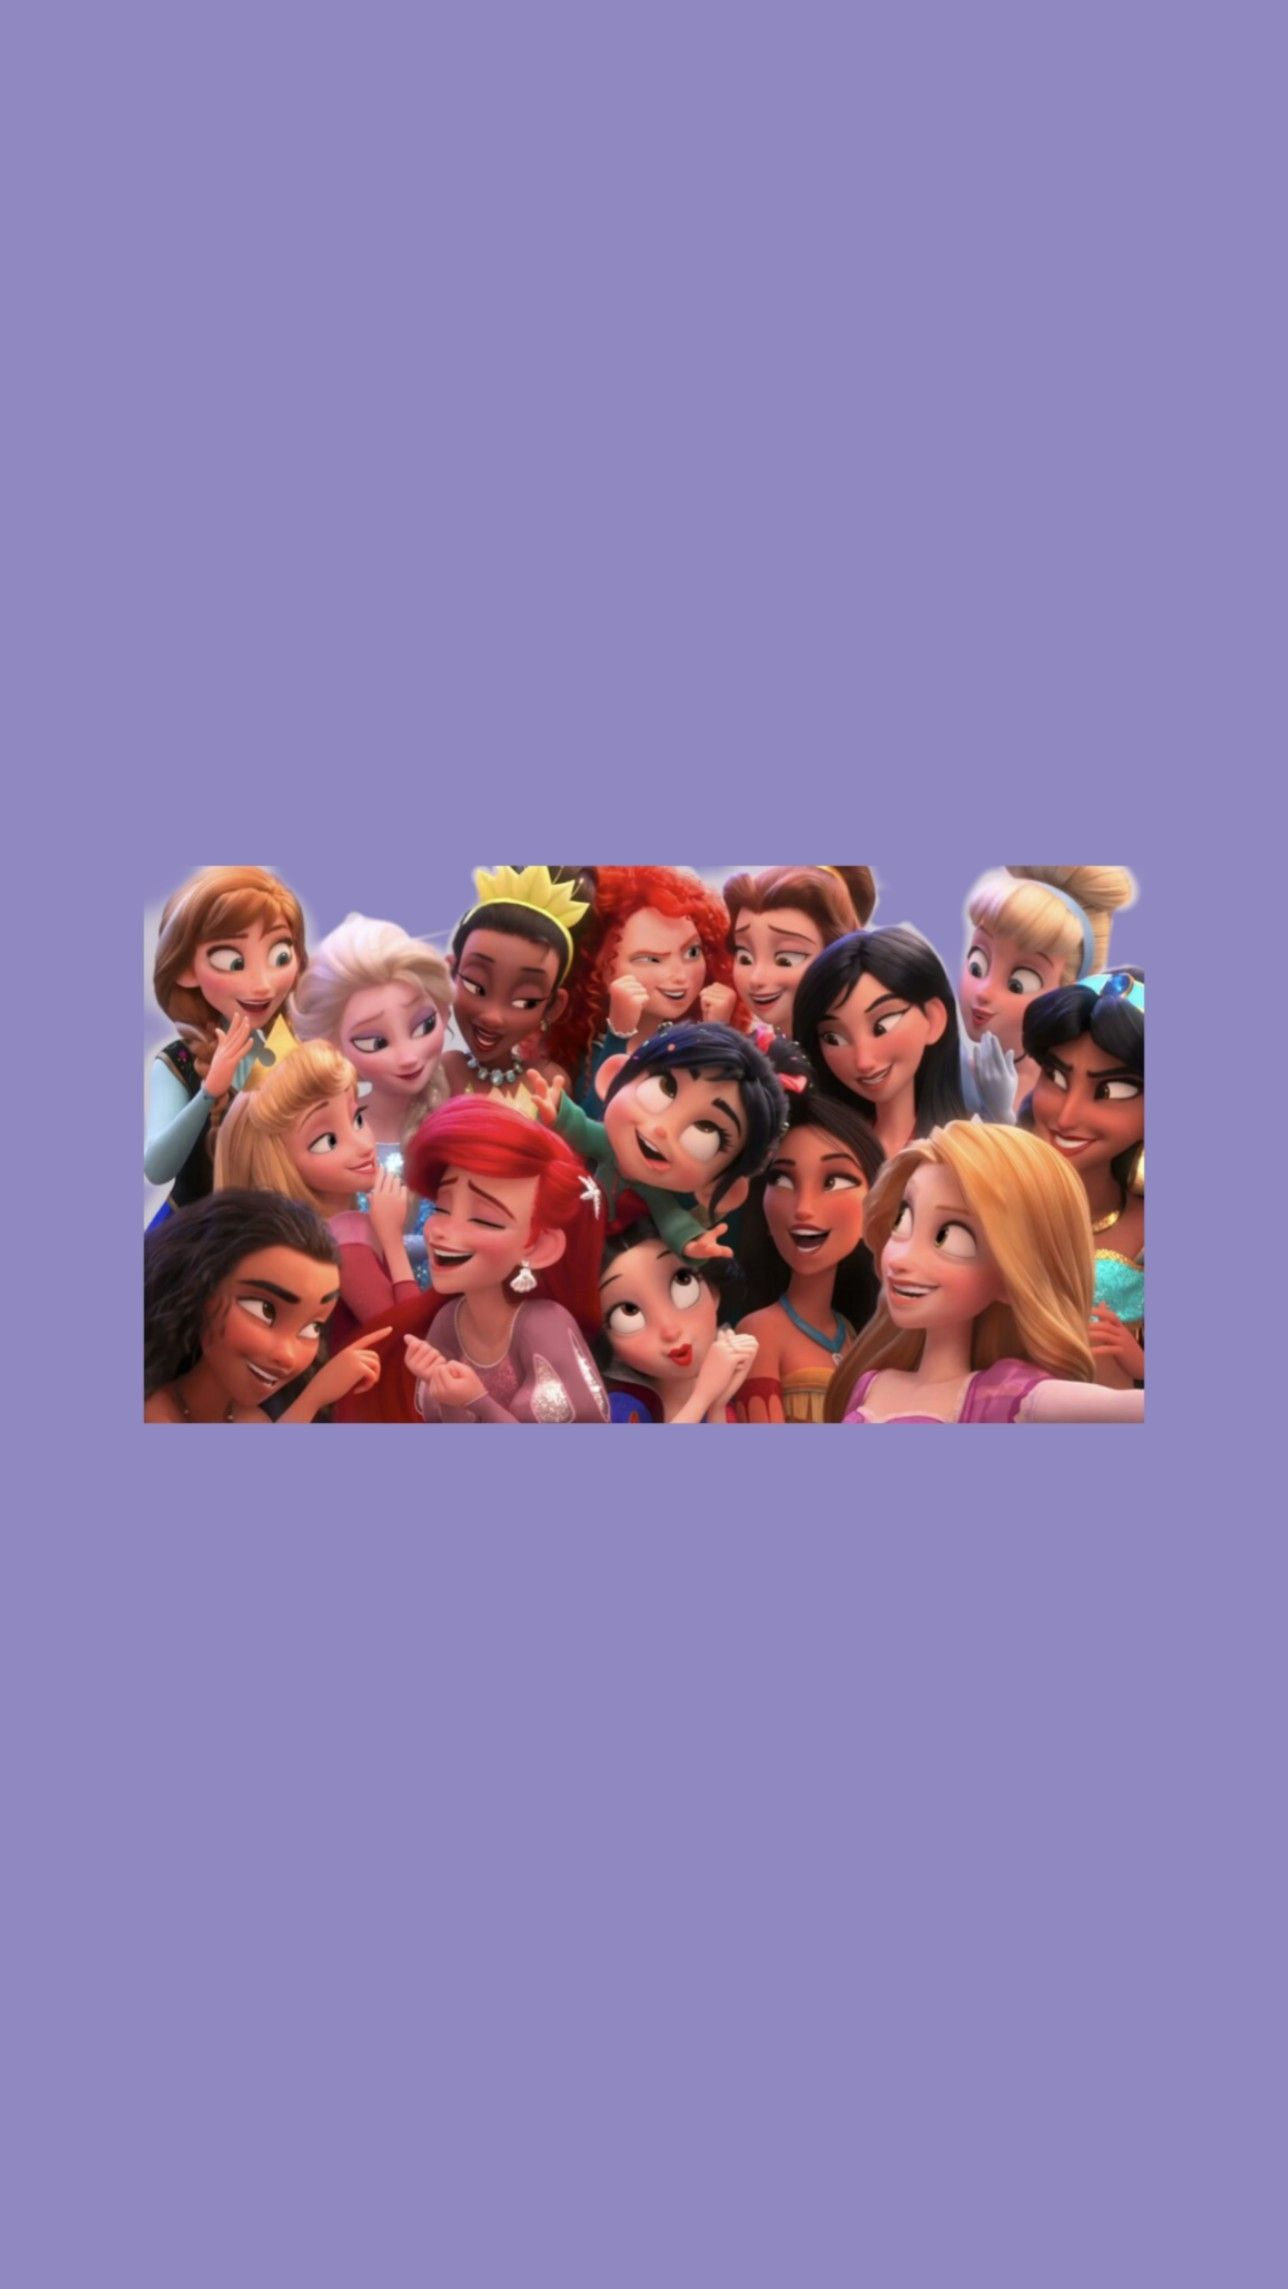 Pin By Enora Brachet On Cute Wallpapers In 2020 Wallpaper Iphone Disney Princess Disney Wallpaper Wallpaper Iphone Disney